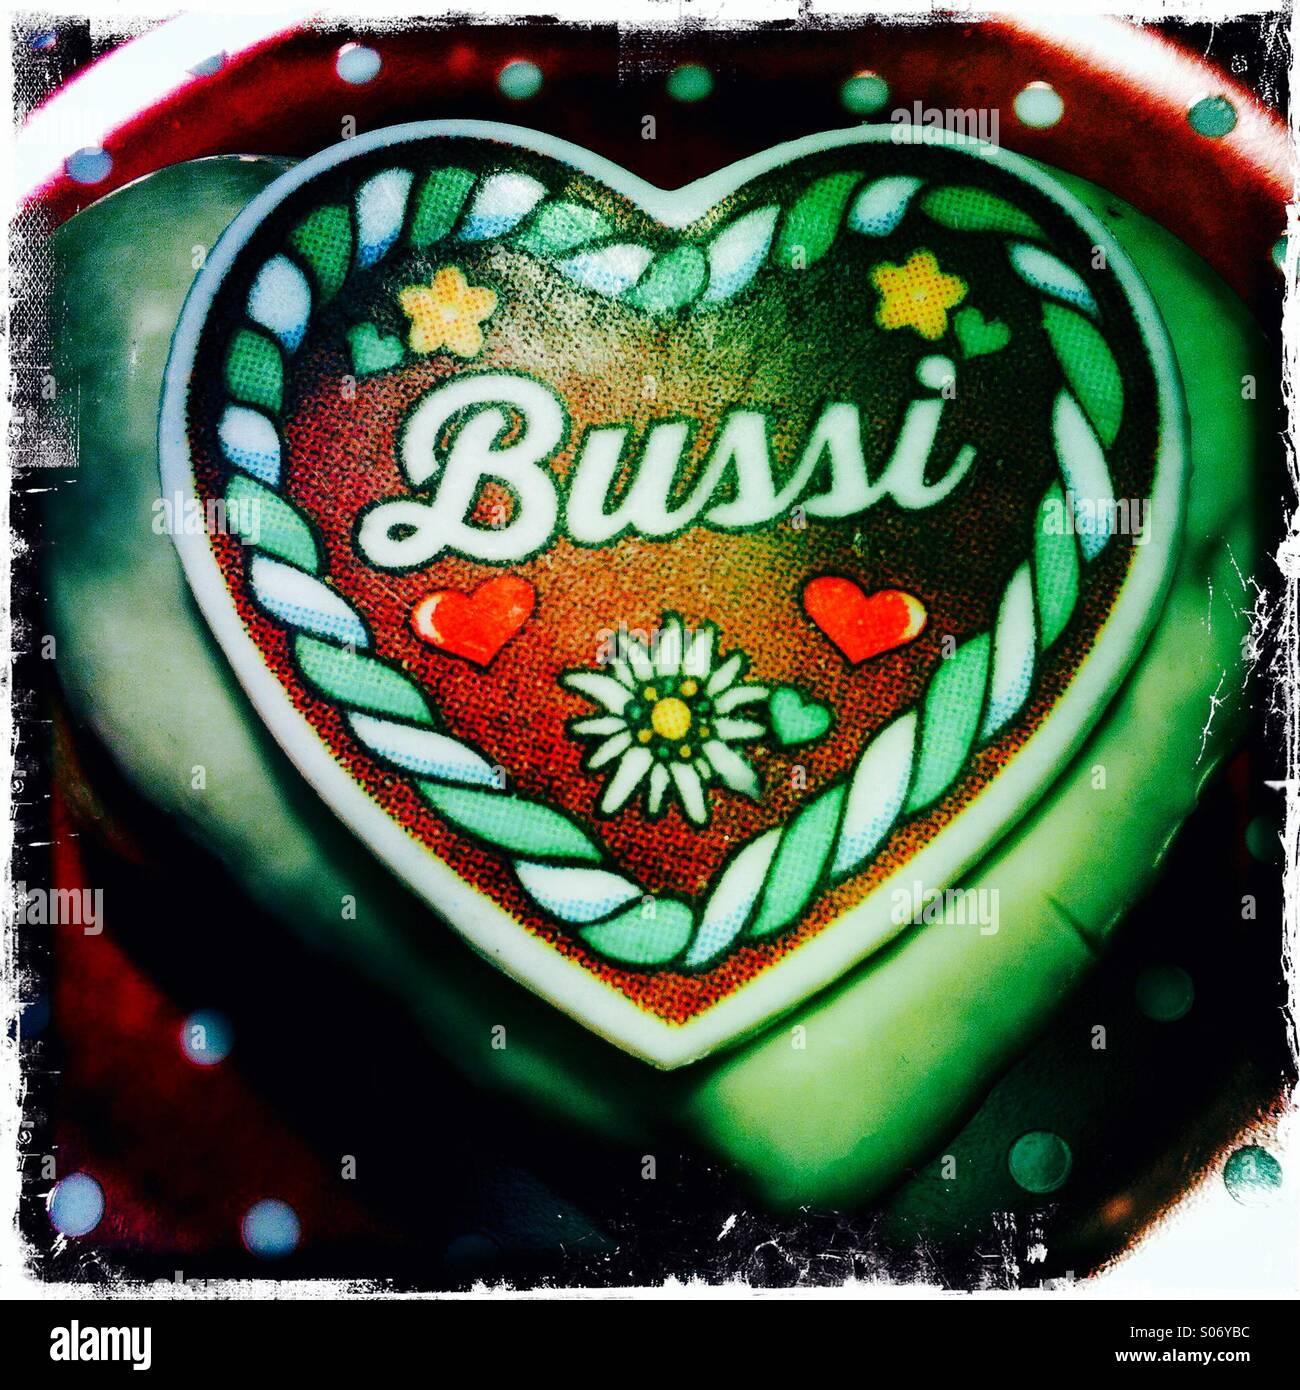 Bussi, kiss, oktoberfest, germany, volksfest. - Stock Image